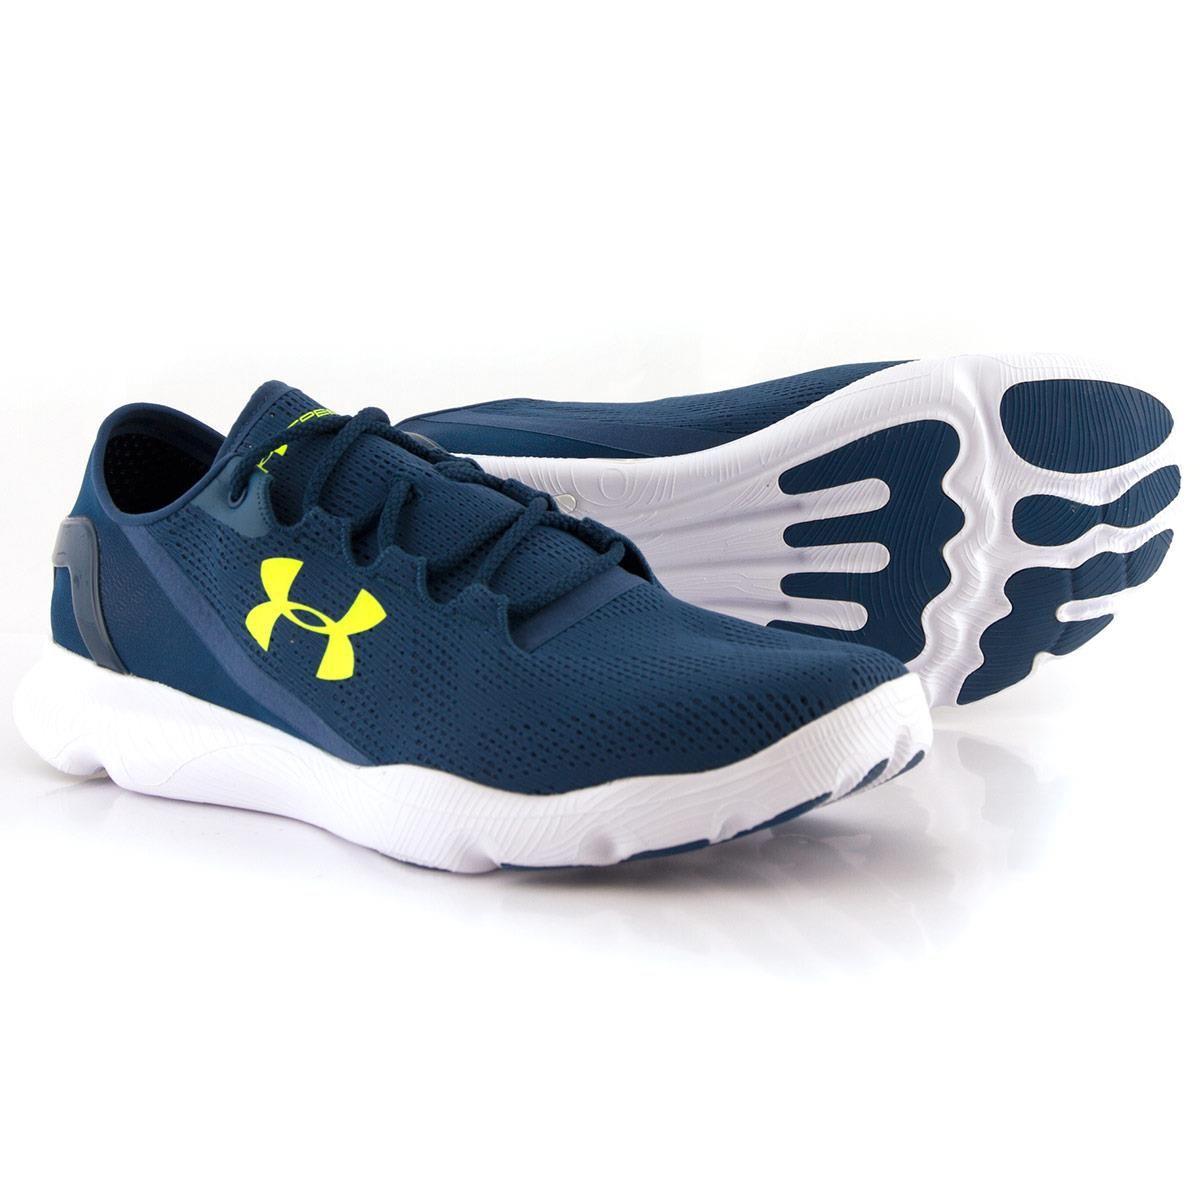 Mens Petrol Blue Under Armour Speedform Apollo Running Shoes